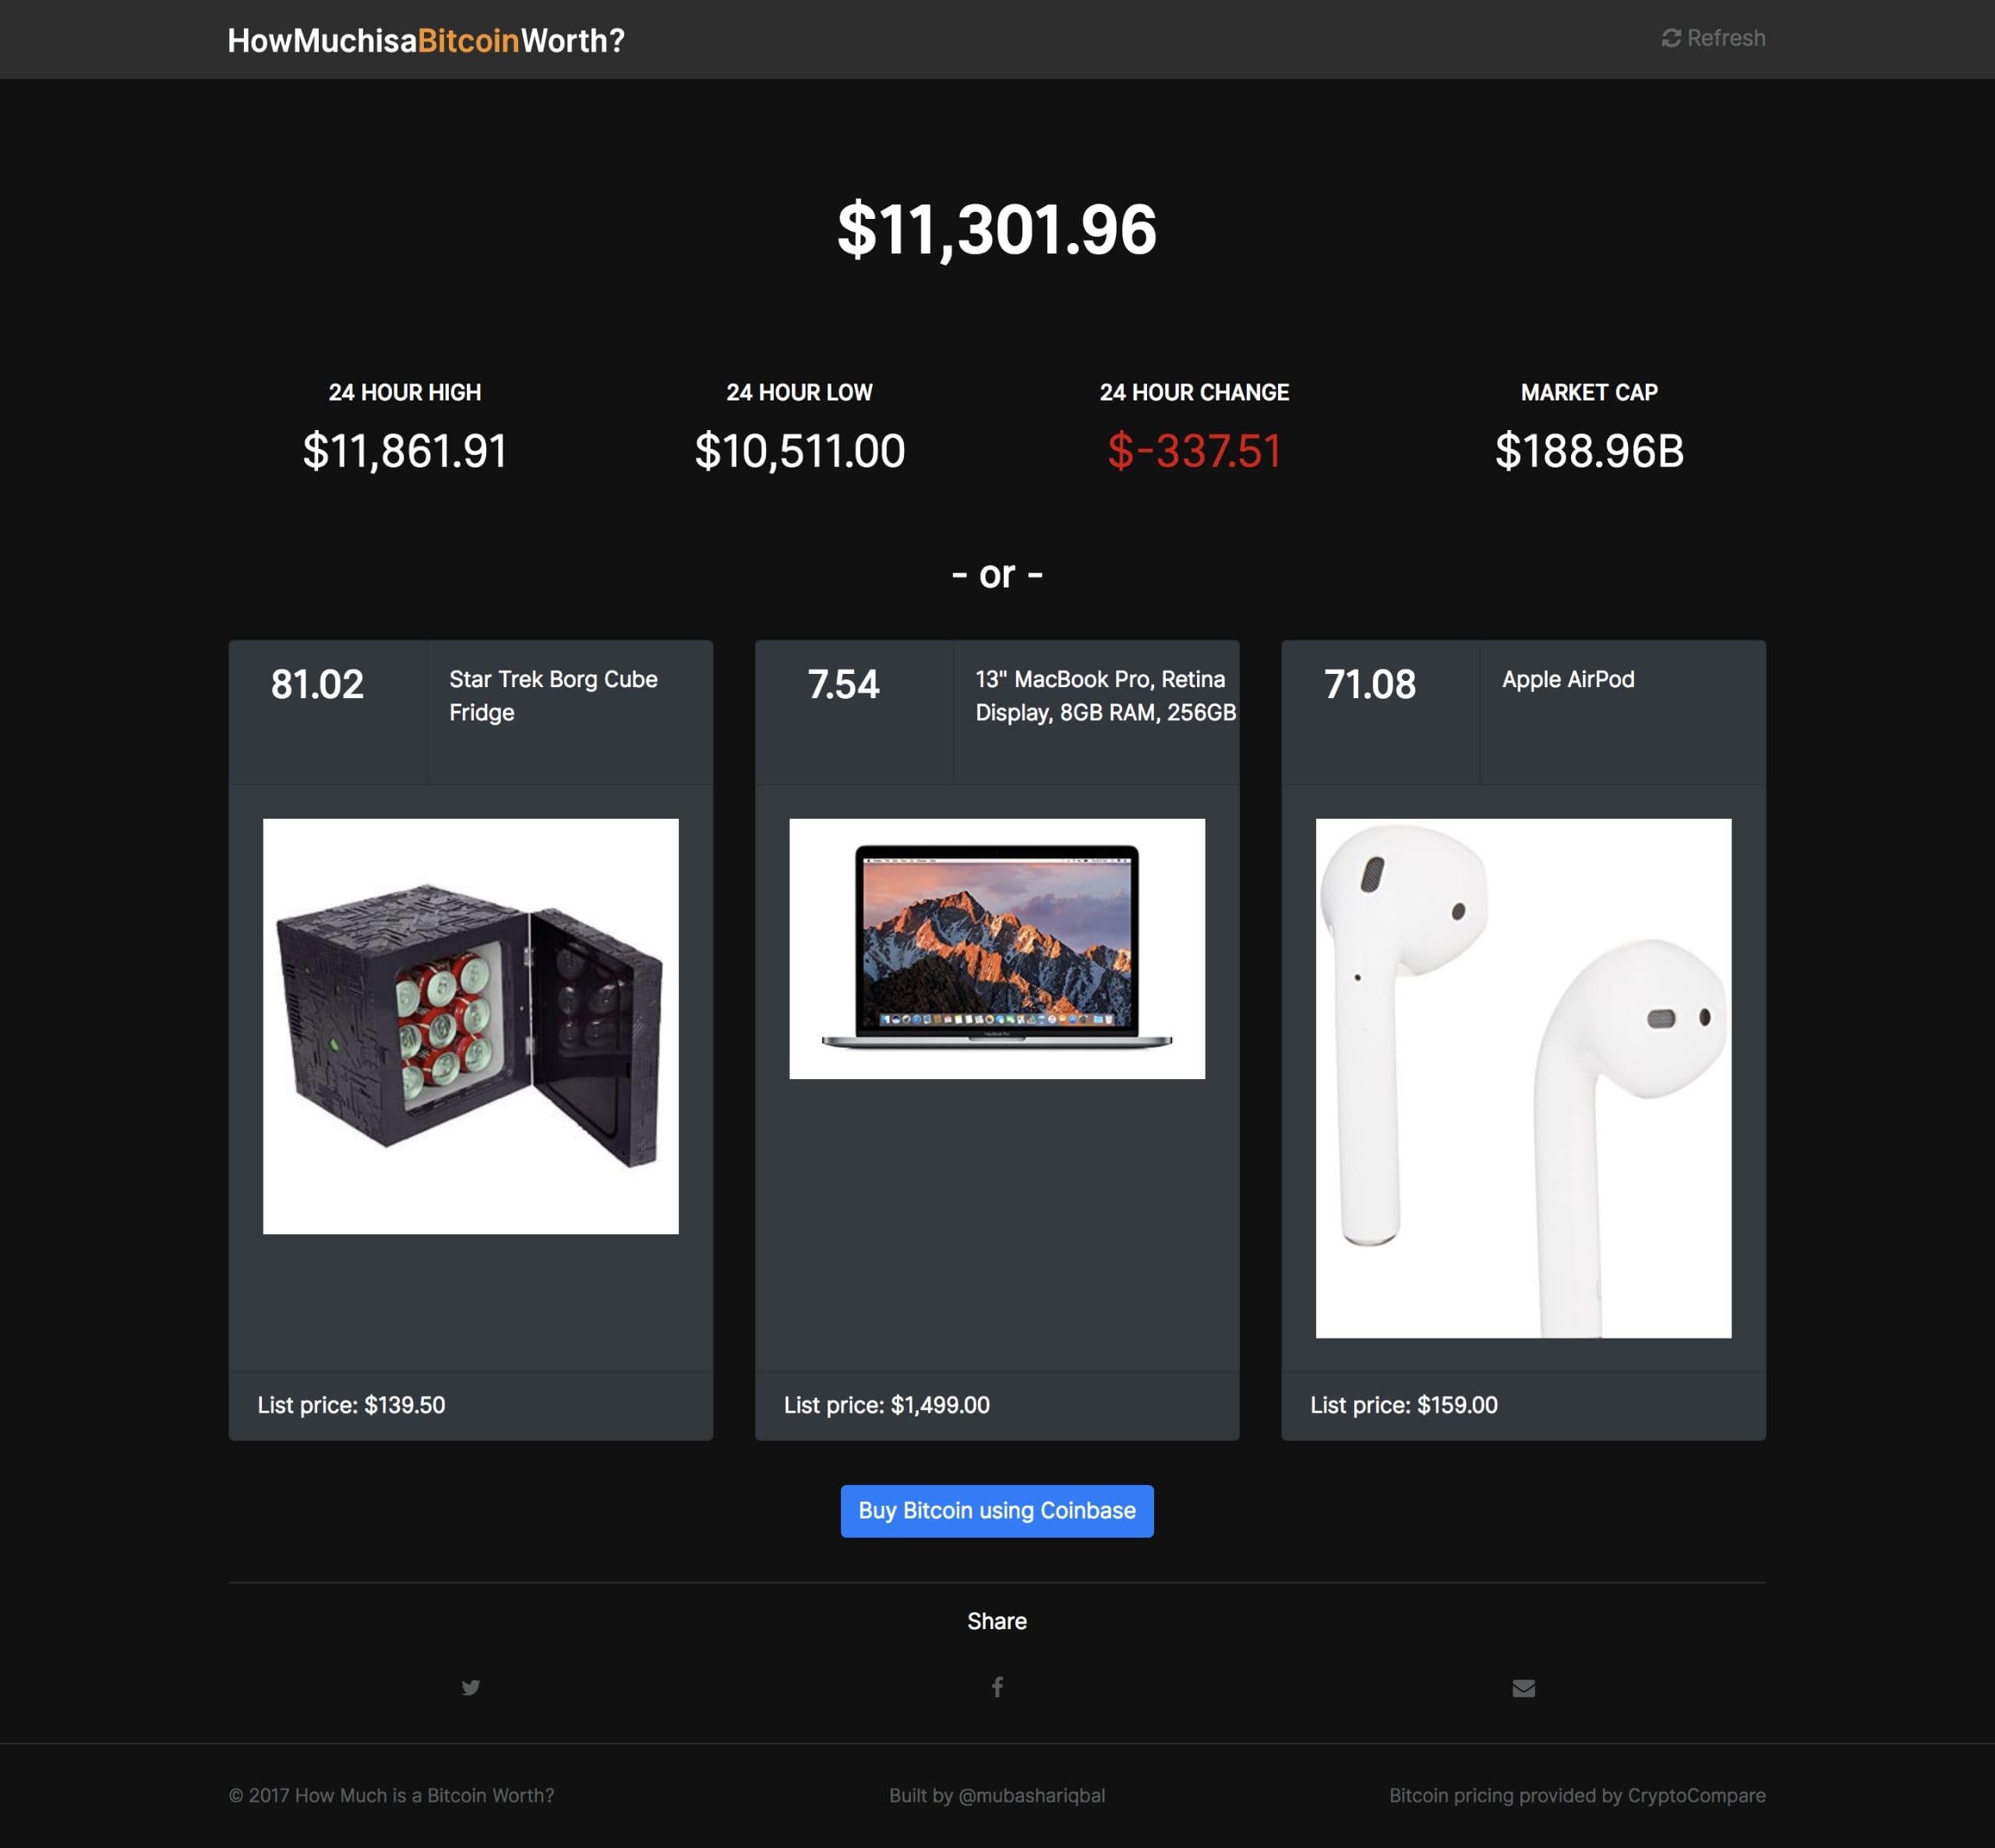 How Much is a Bitcoin Worth? Website Screenshot